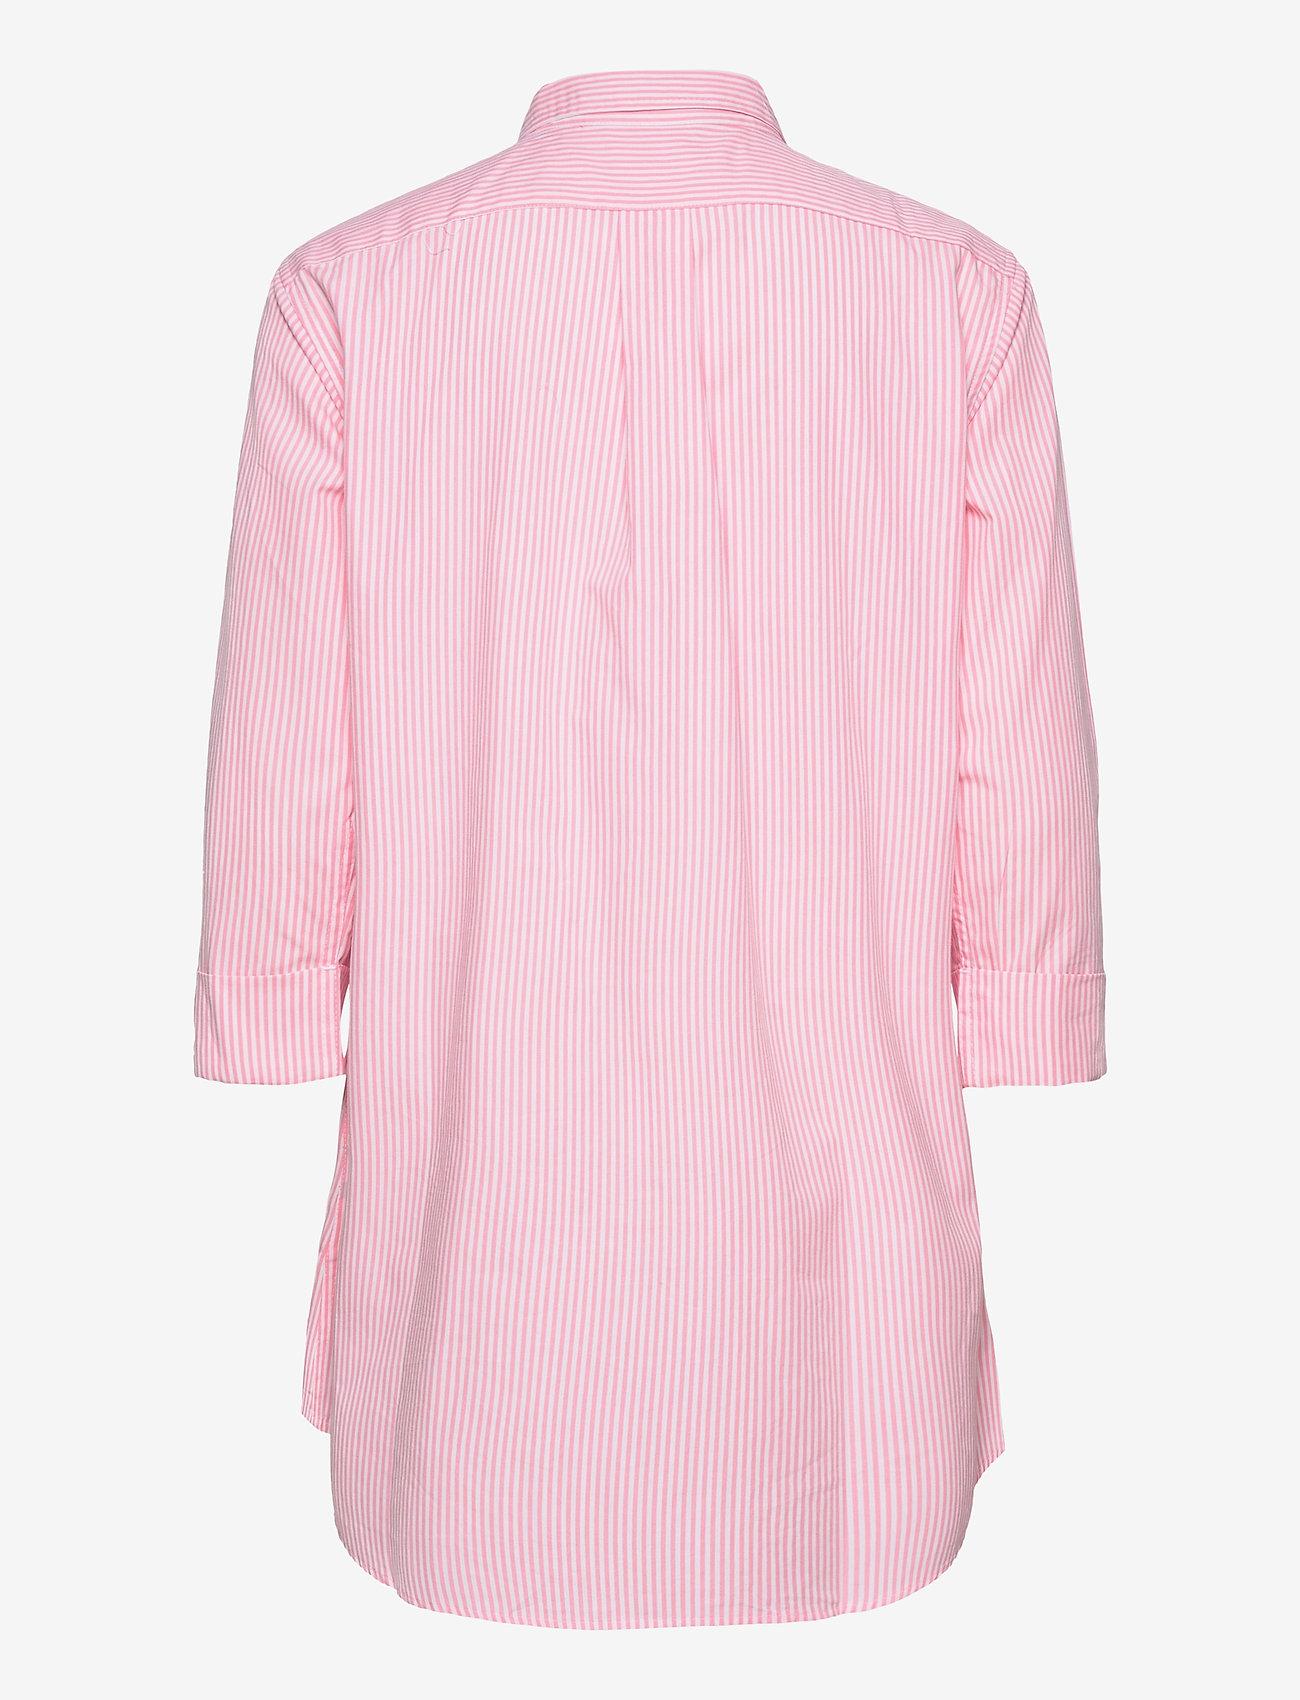 Lauren Ralph Lauren Homewear - LRL HERITAGE ESS. 3/4 SL SLEEPSHIRT - overdele - pink/white stripe - 1